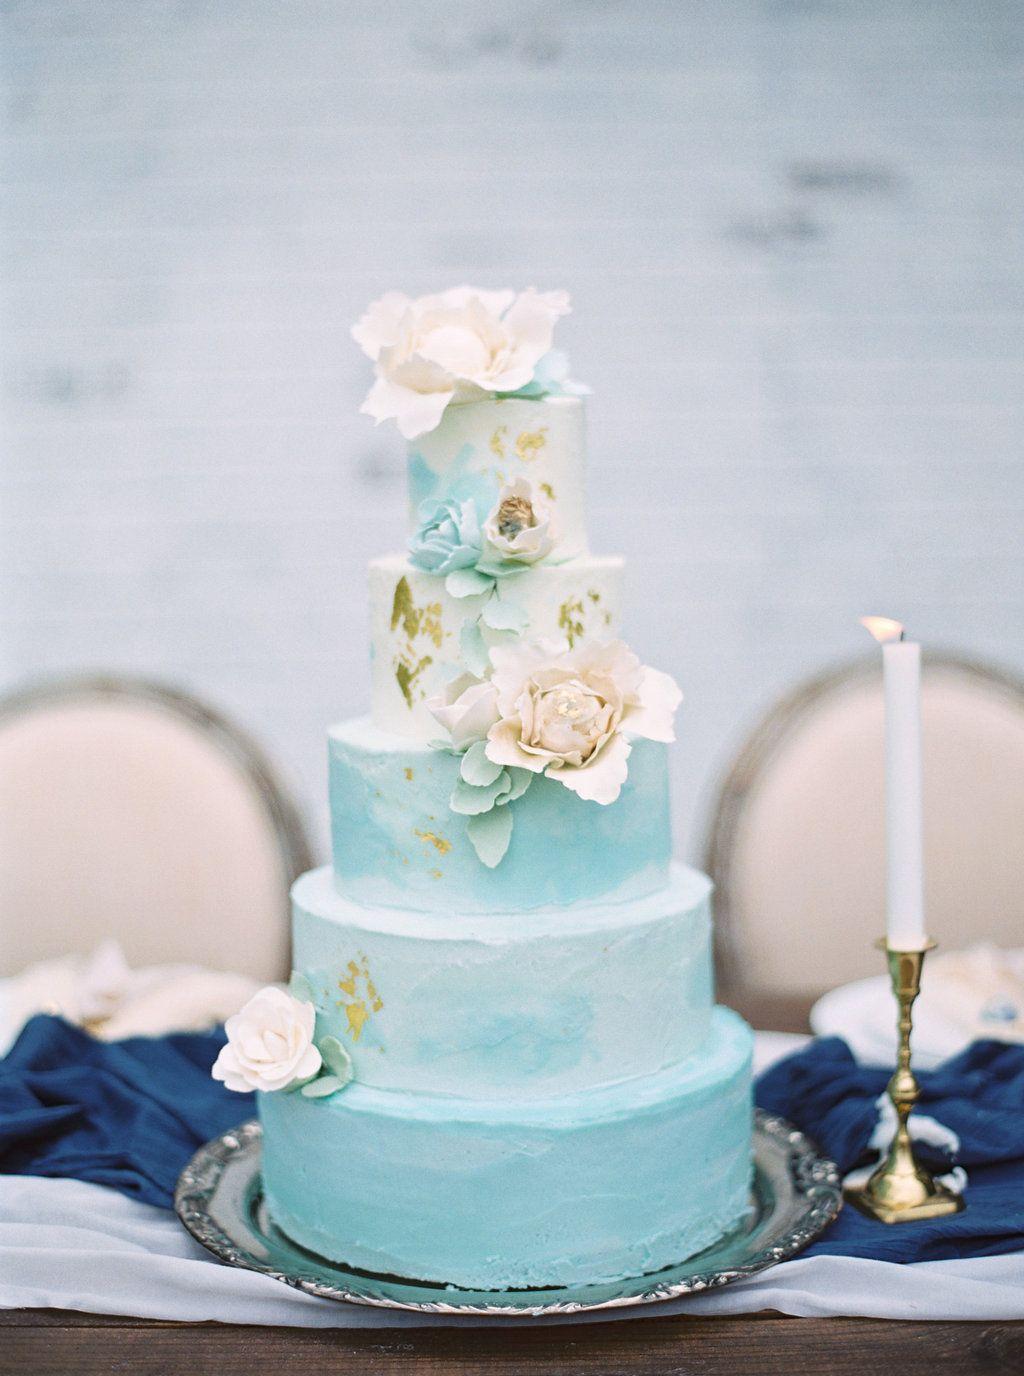 21 Ideas for a Beautiful Aquamarine Wedding | Wedding cake, Cake and ...